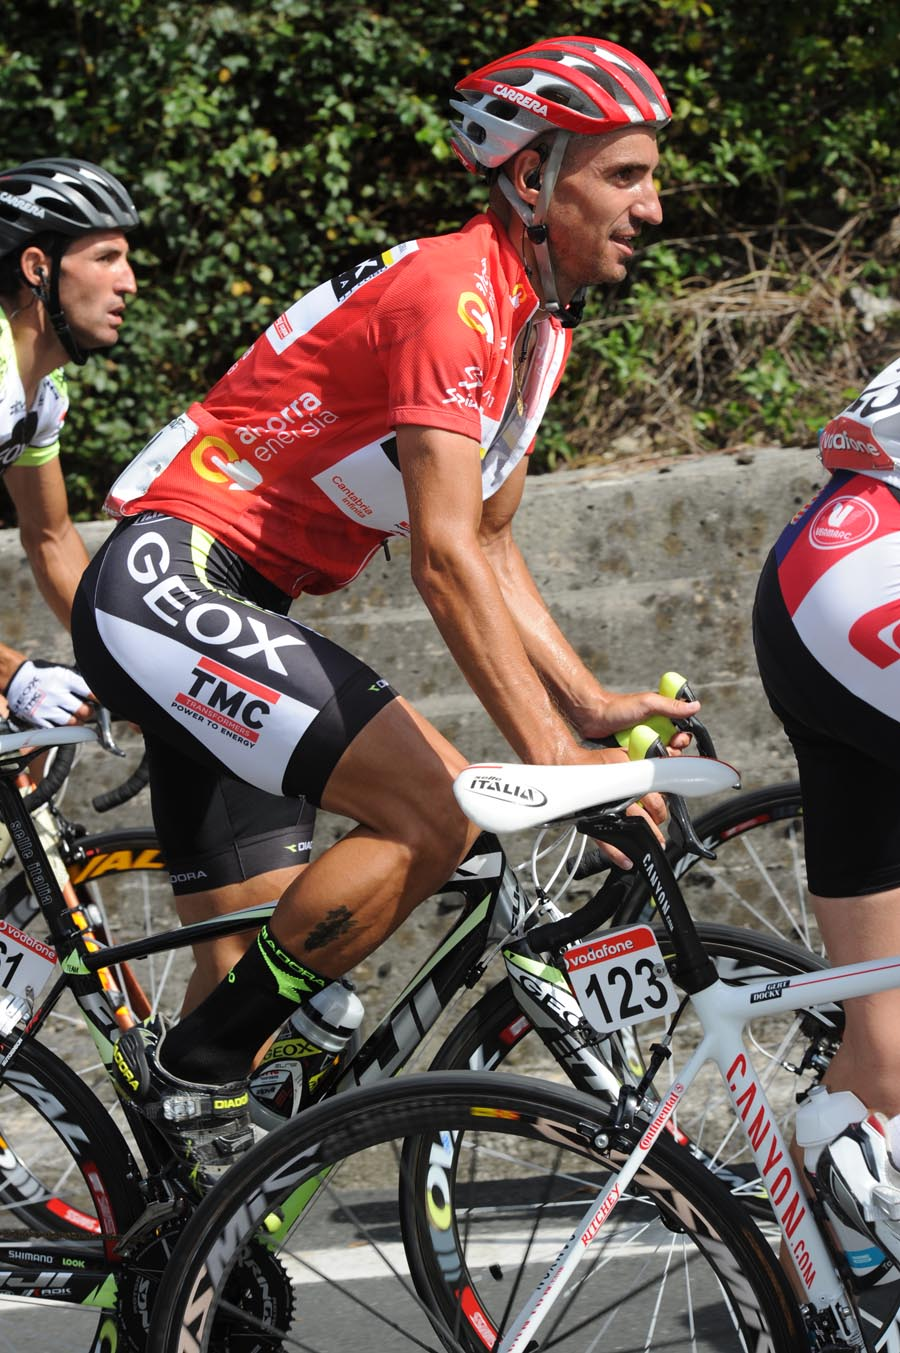 Juan Jose Cobo, Vuelta a Espana 2011, stage 20